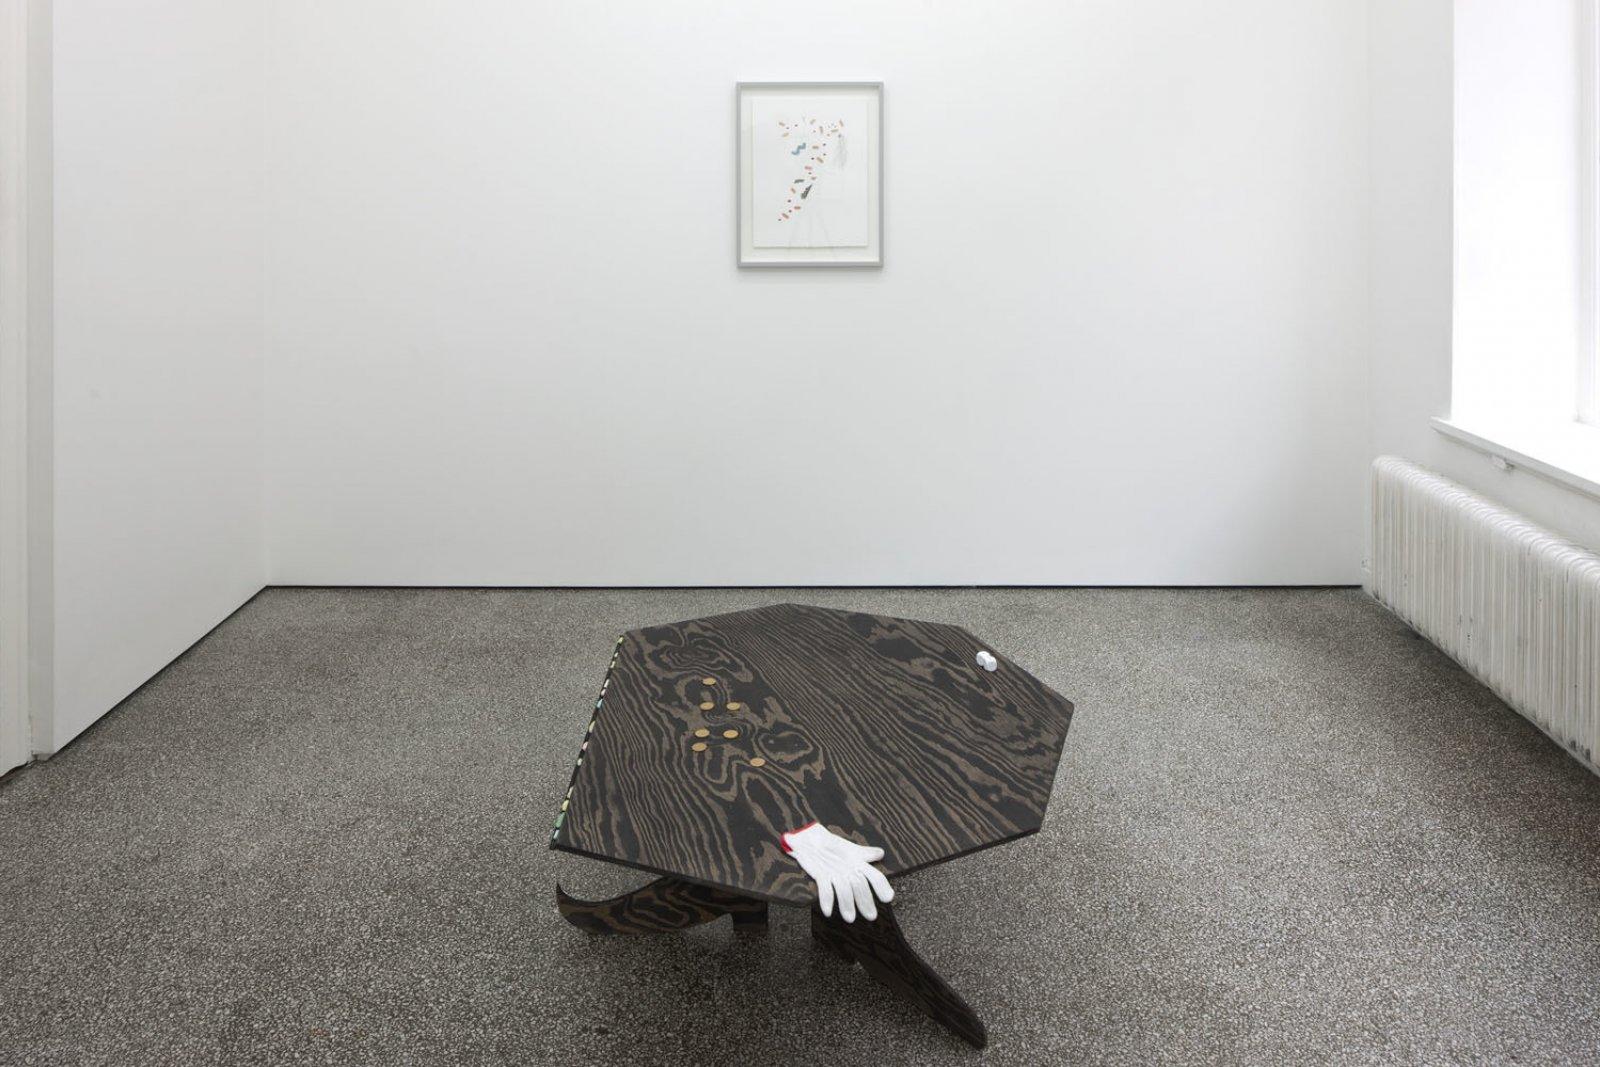 Julia Feyrer, installation view, Irregular Time Signatures, Johan Berggren Gallery, Malmö, Sweden by Julia Feyrer